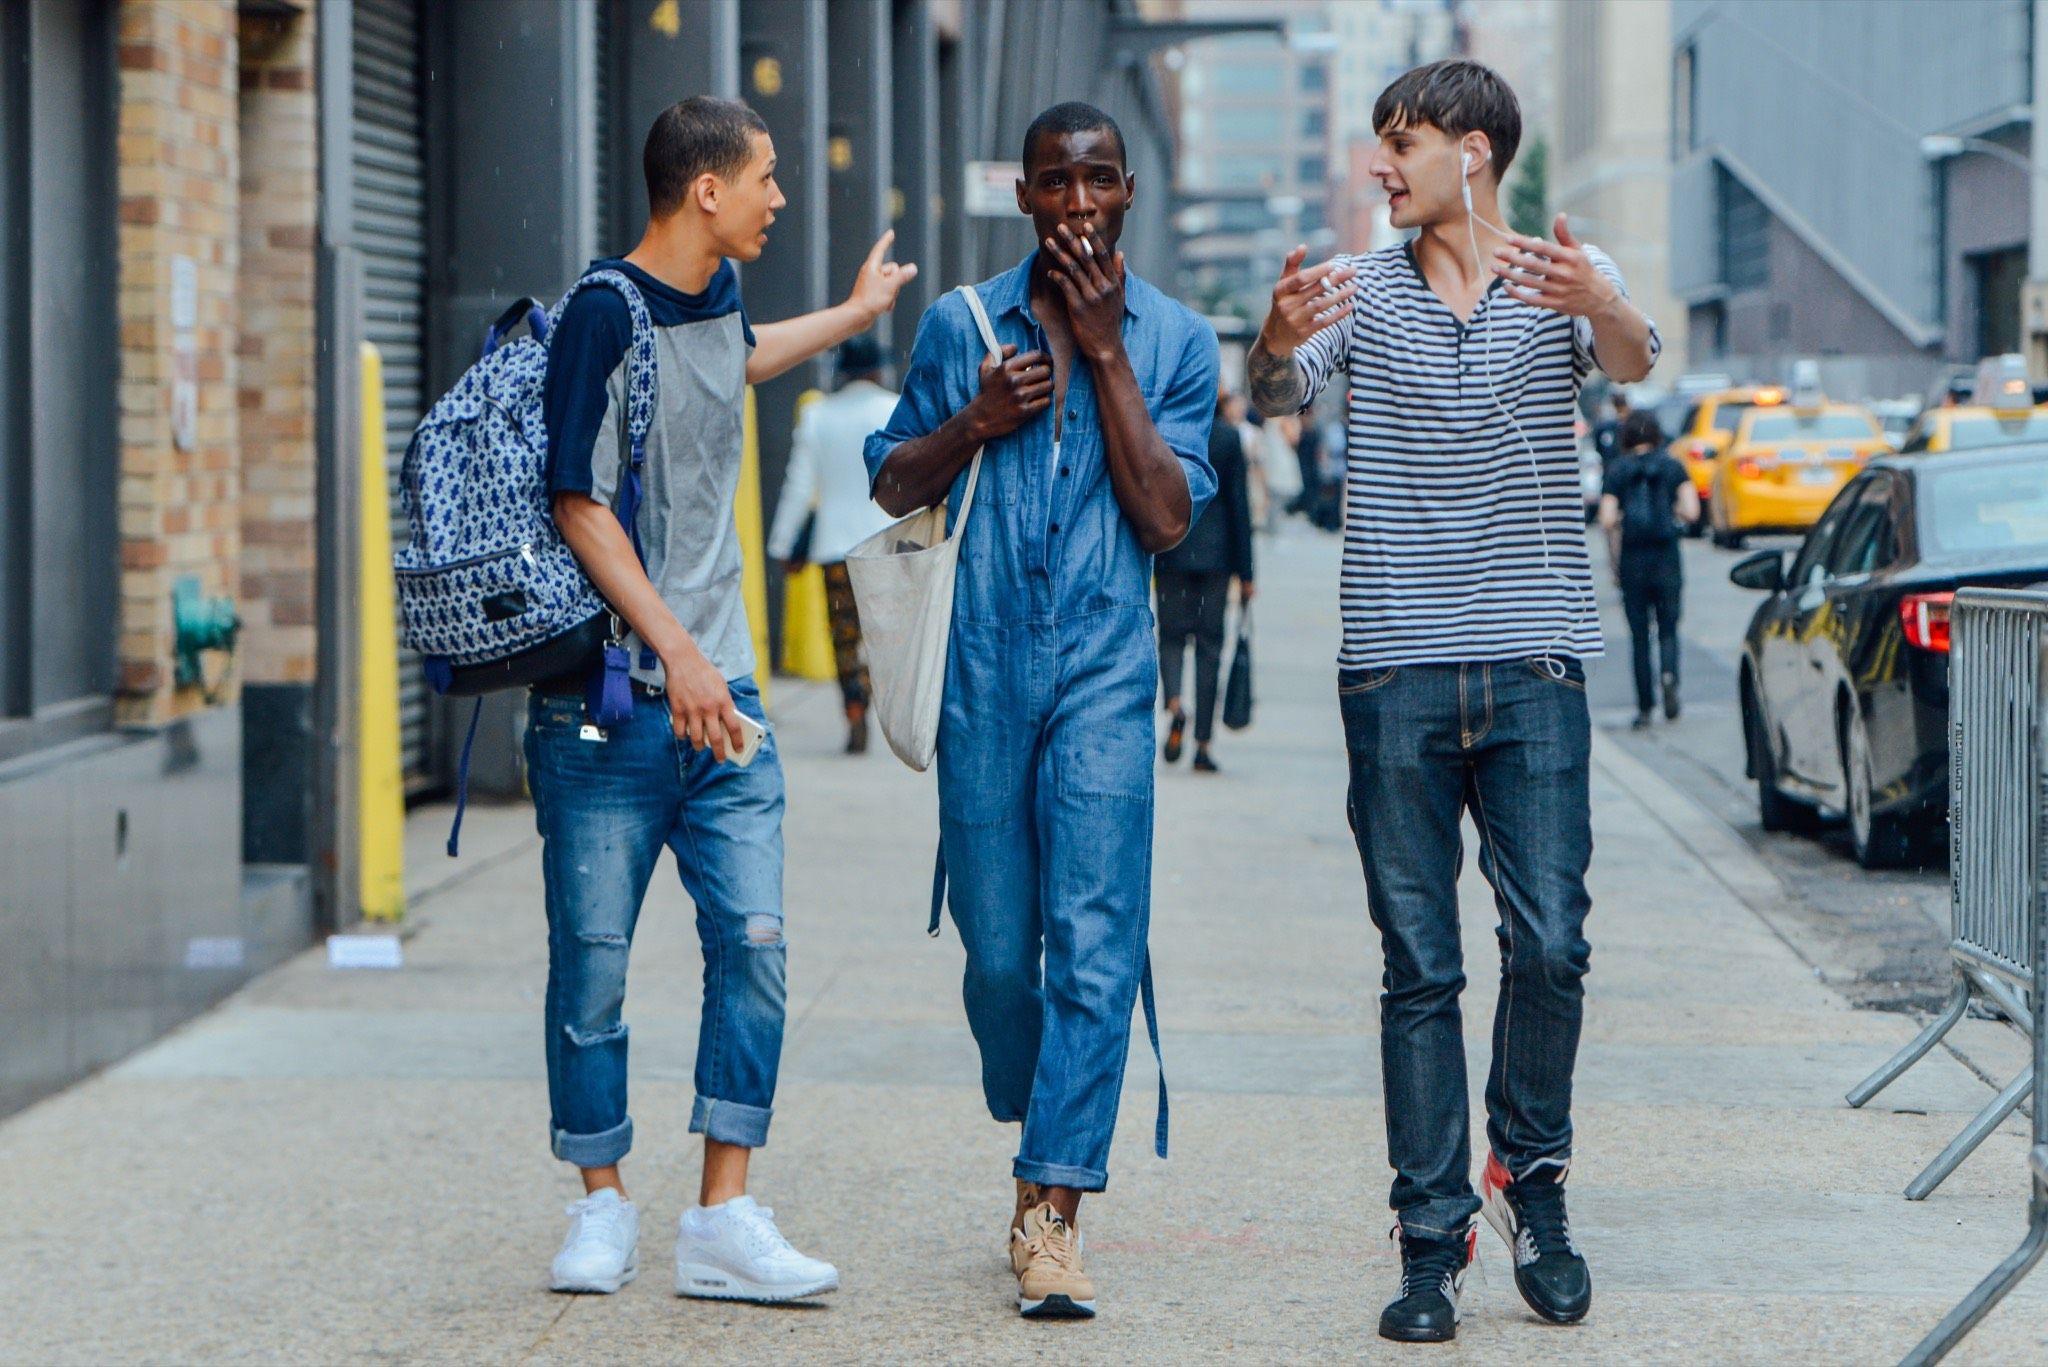 London or new york better for asian man dating